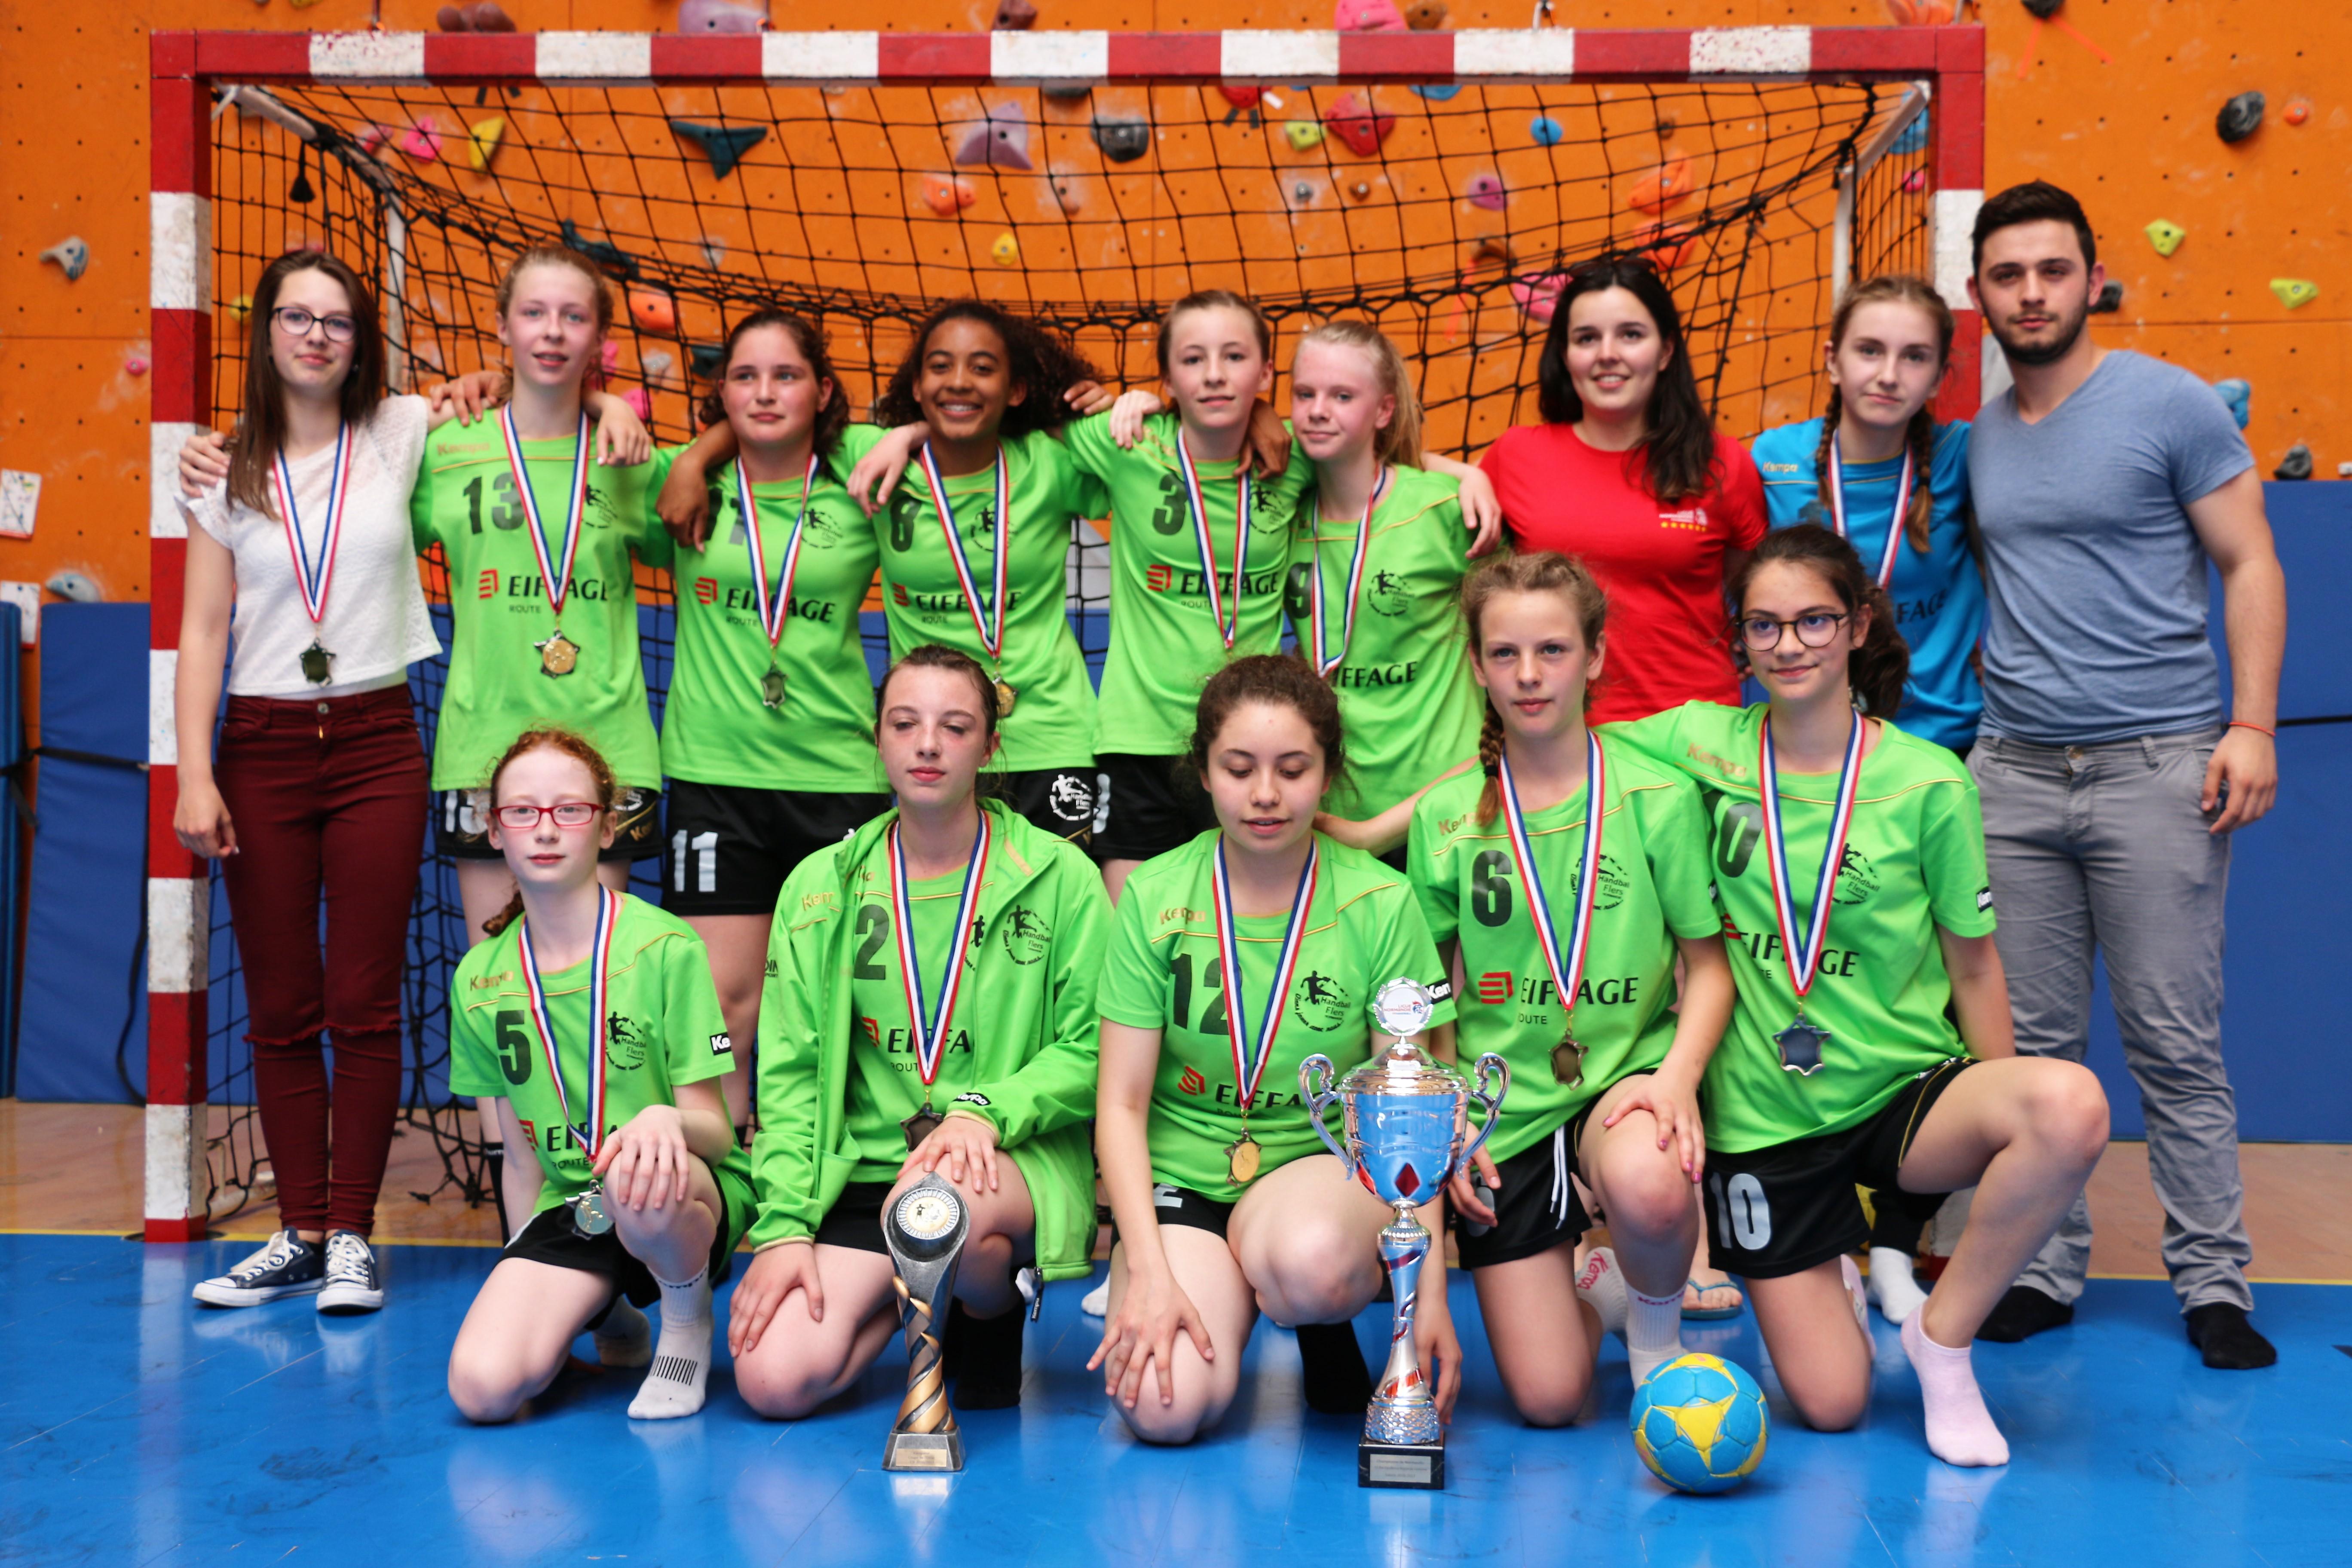 R sultats de la coupe de l 39 orne handball flers - Resultat coupe de france handball feminin ...